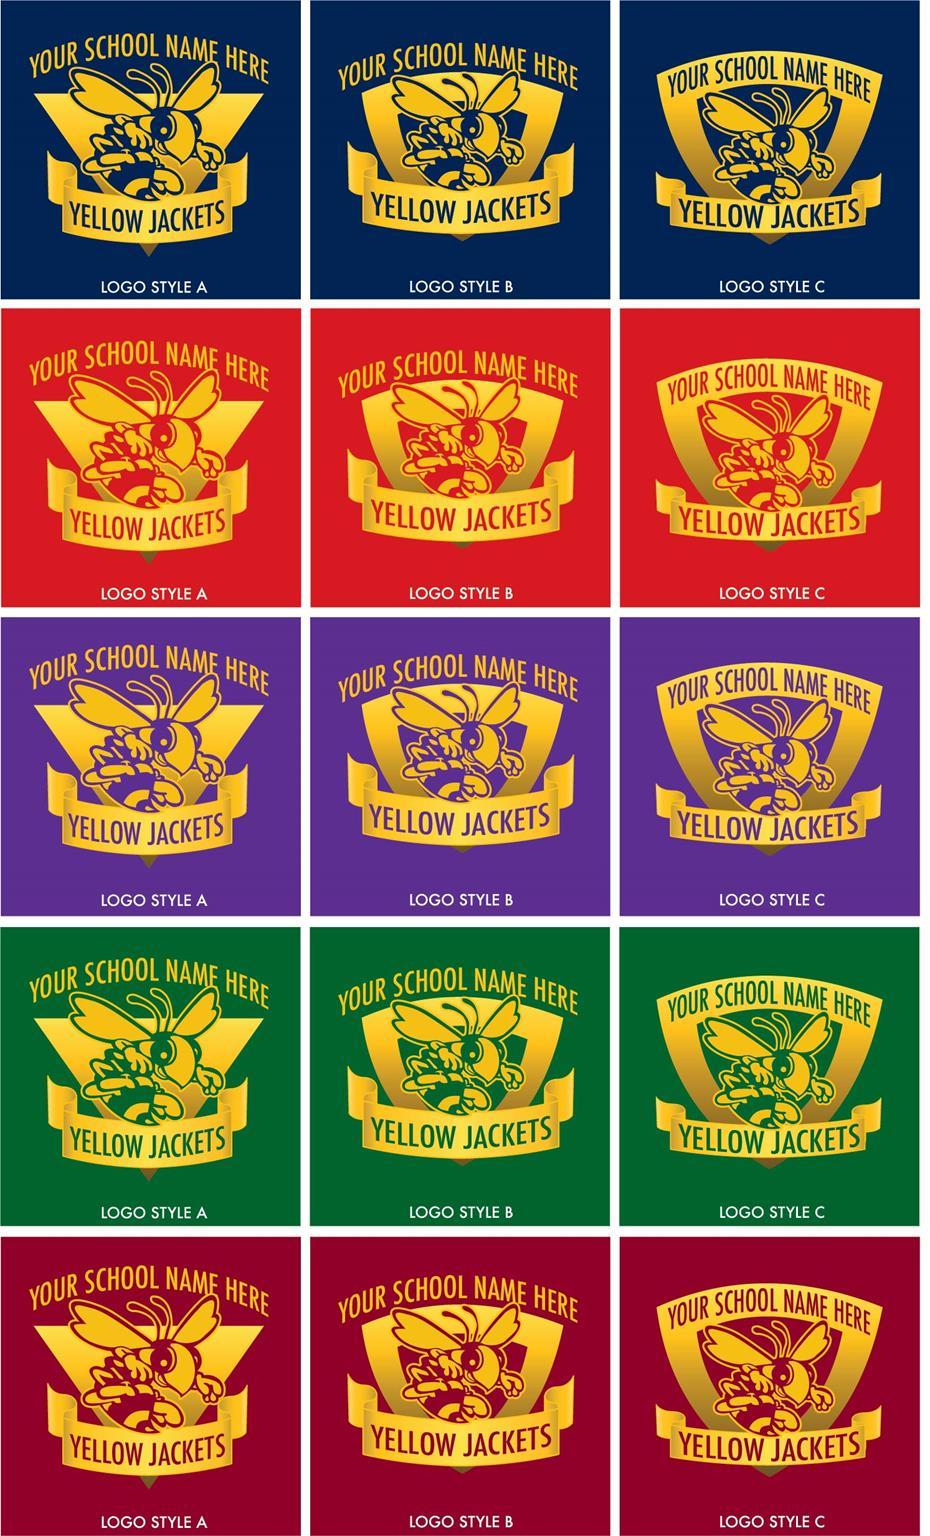 Yellow Jacket Mascot Logo School